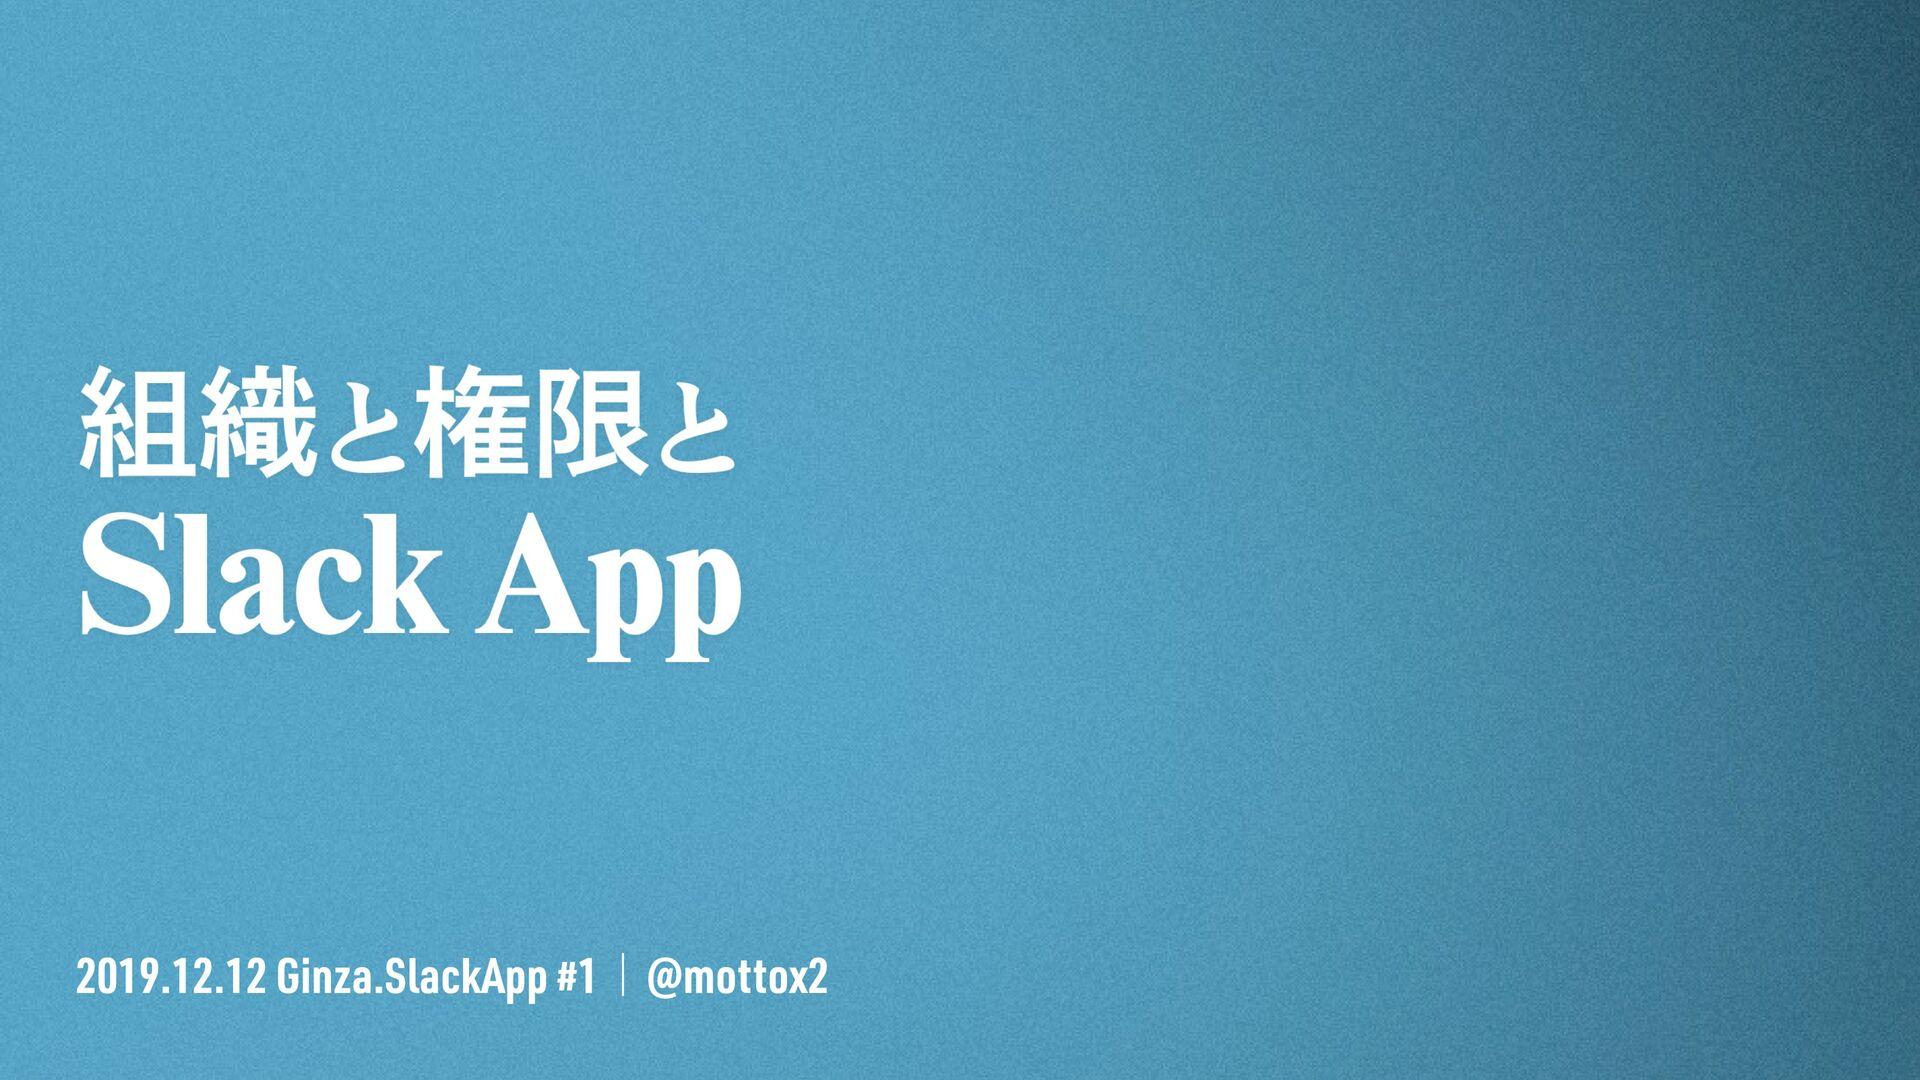 2019.12.12 Ginza.SlackApp #1 / @mottox2 組織と権限と ...